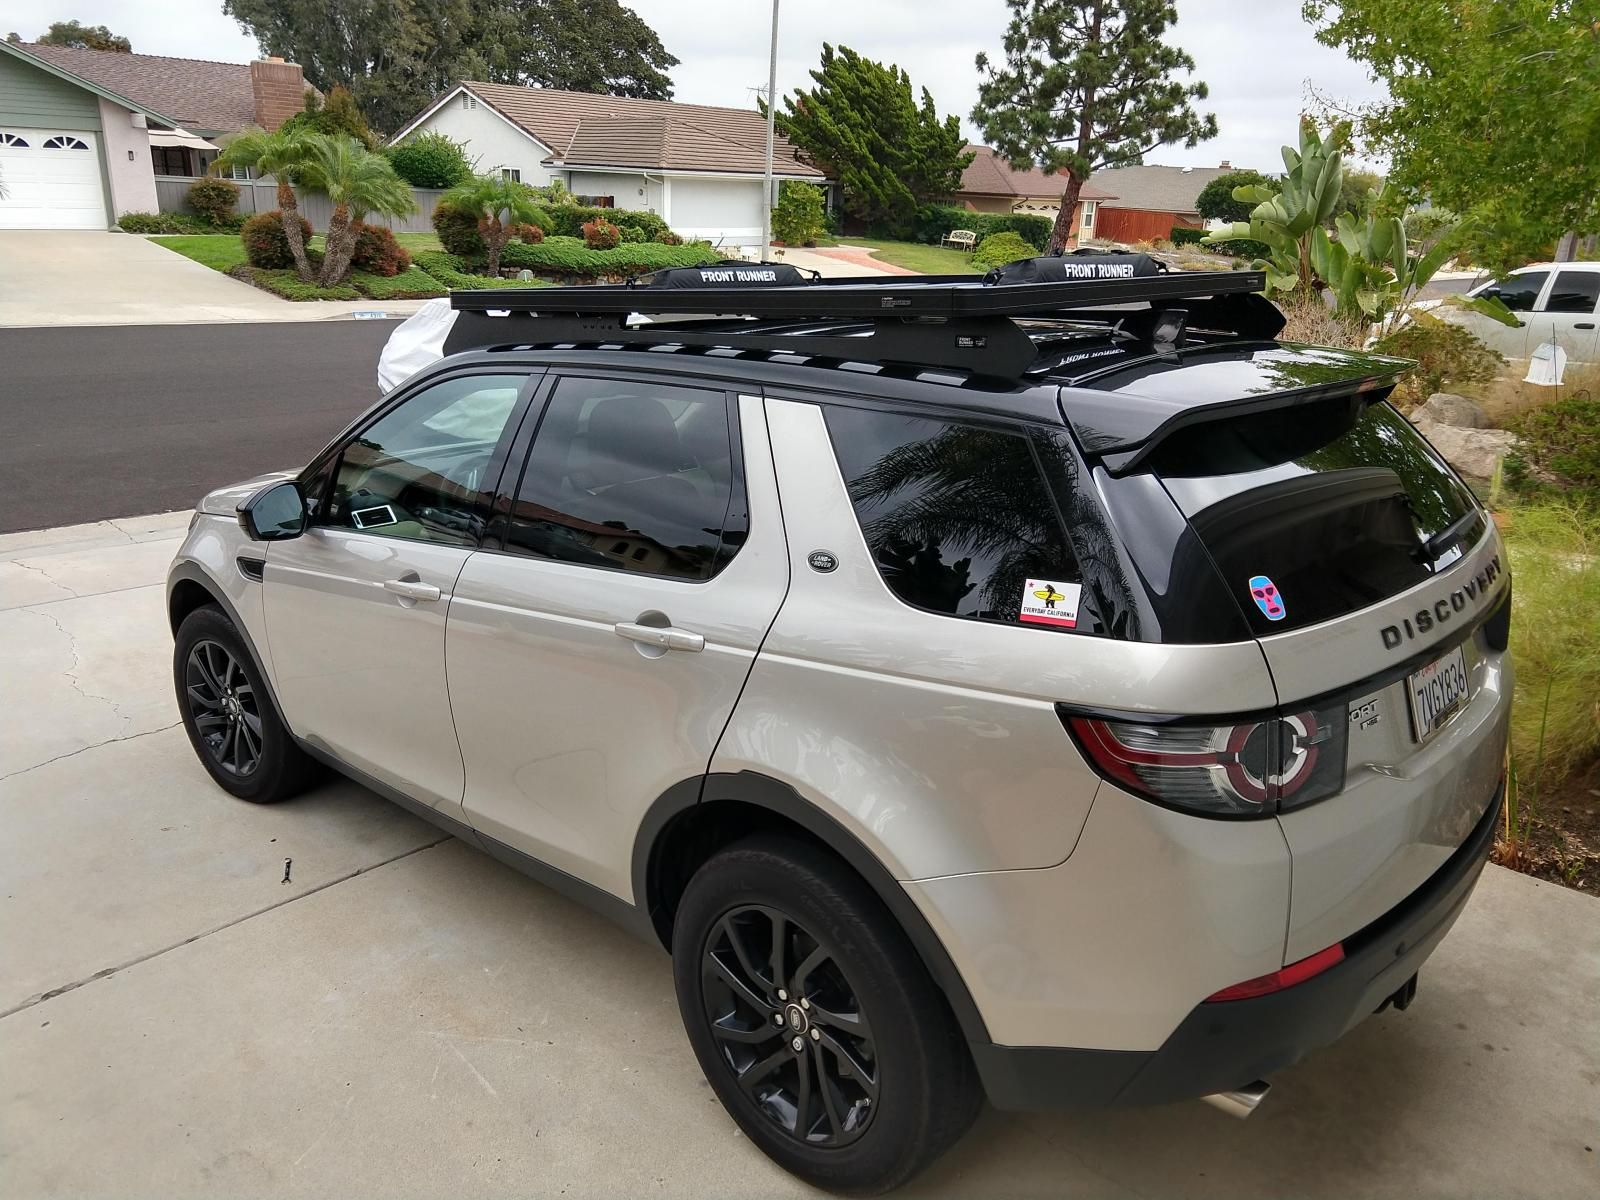 Safari Type Roof Rack For Panoramic Roof Land Rover Discovery Sport Forum Land Rover Discovery Sport Land Rover Sport Land Rover